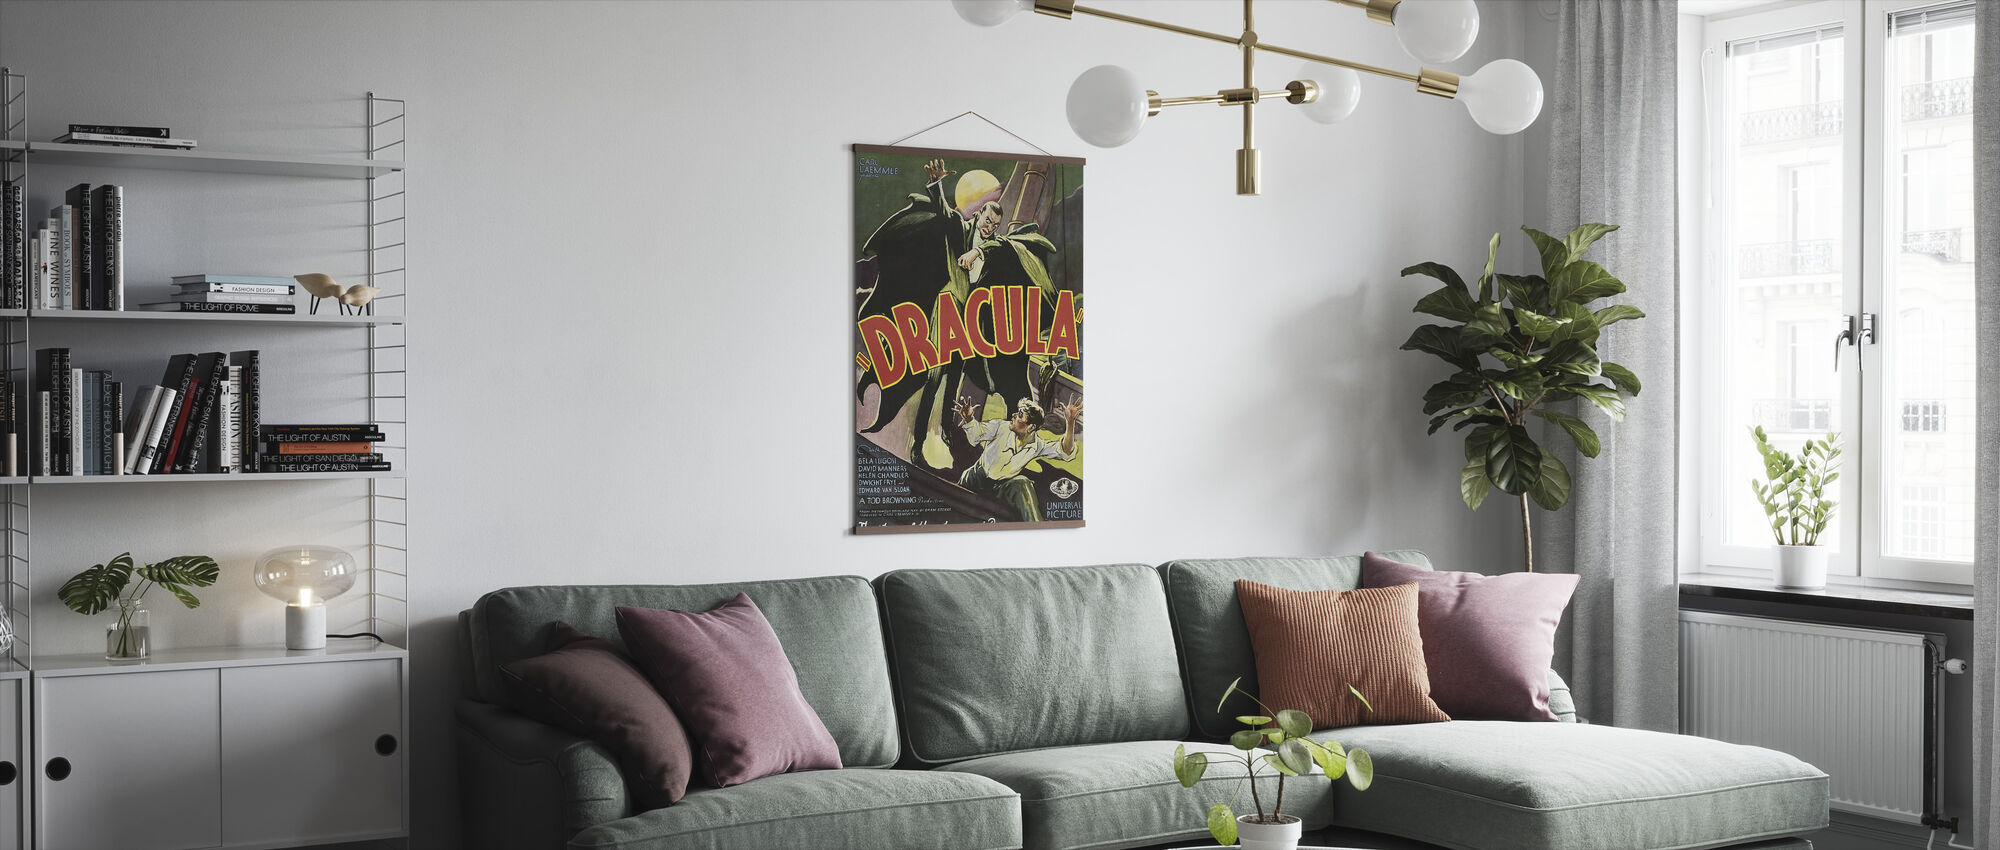 Dracula - Poster - Vardagsrum